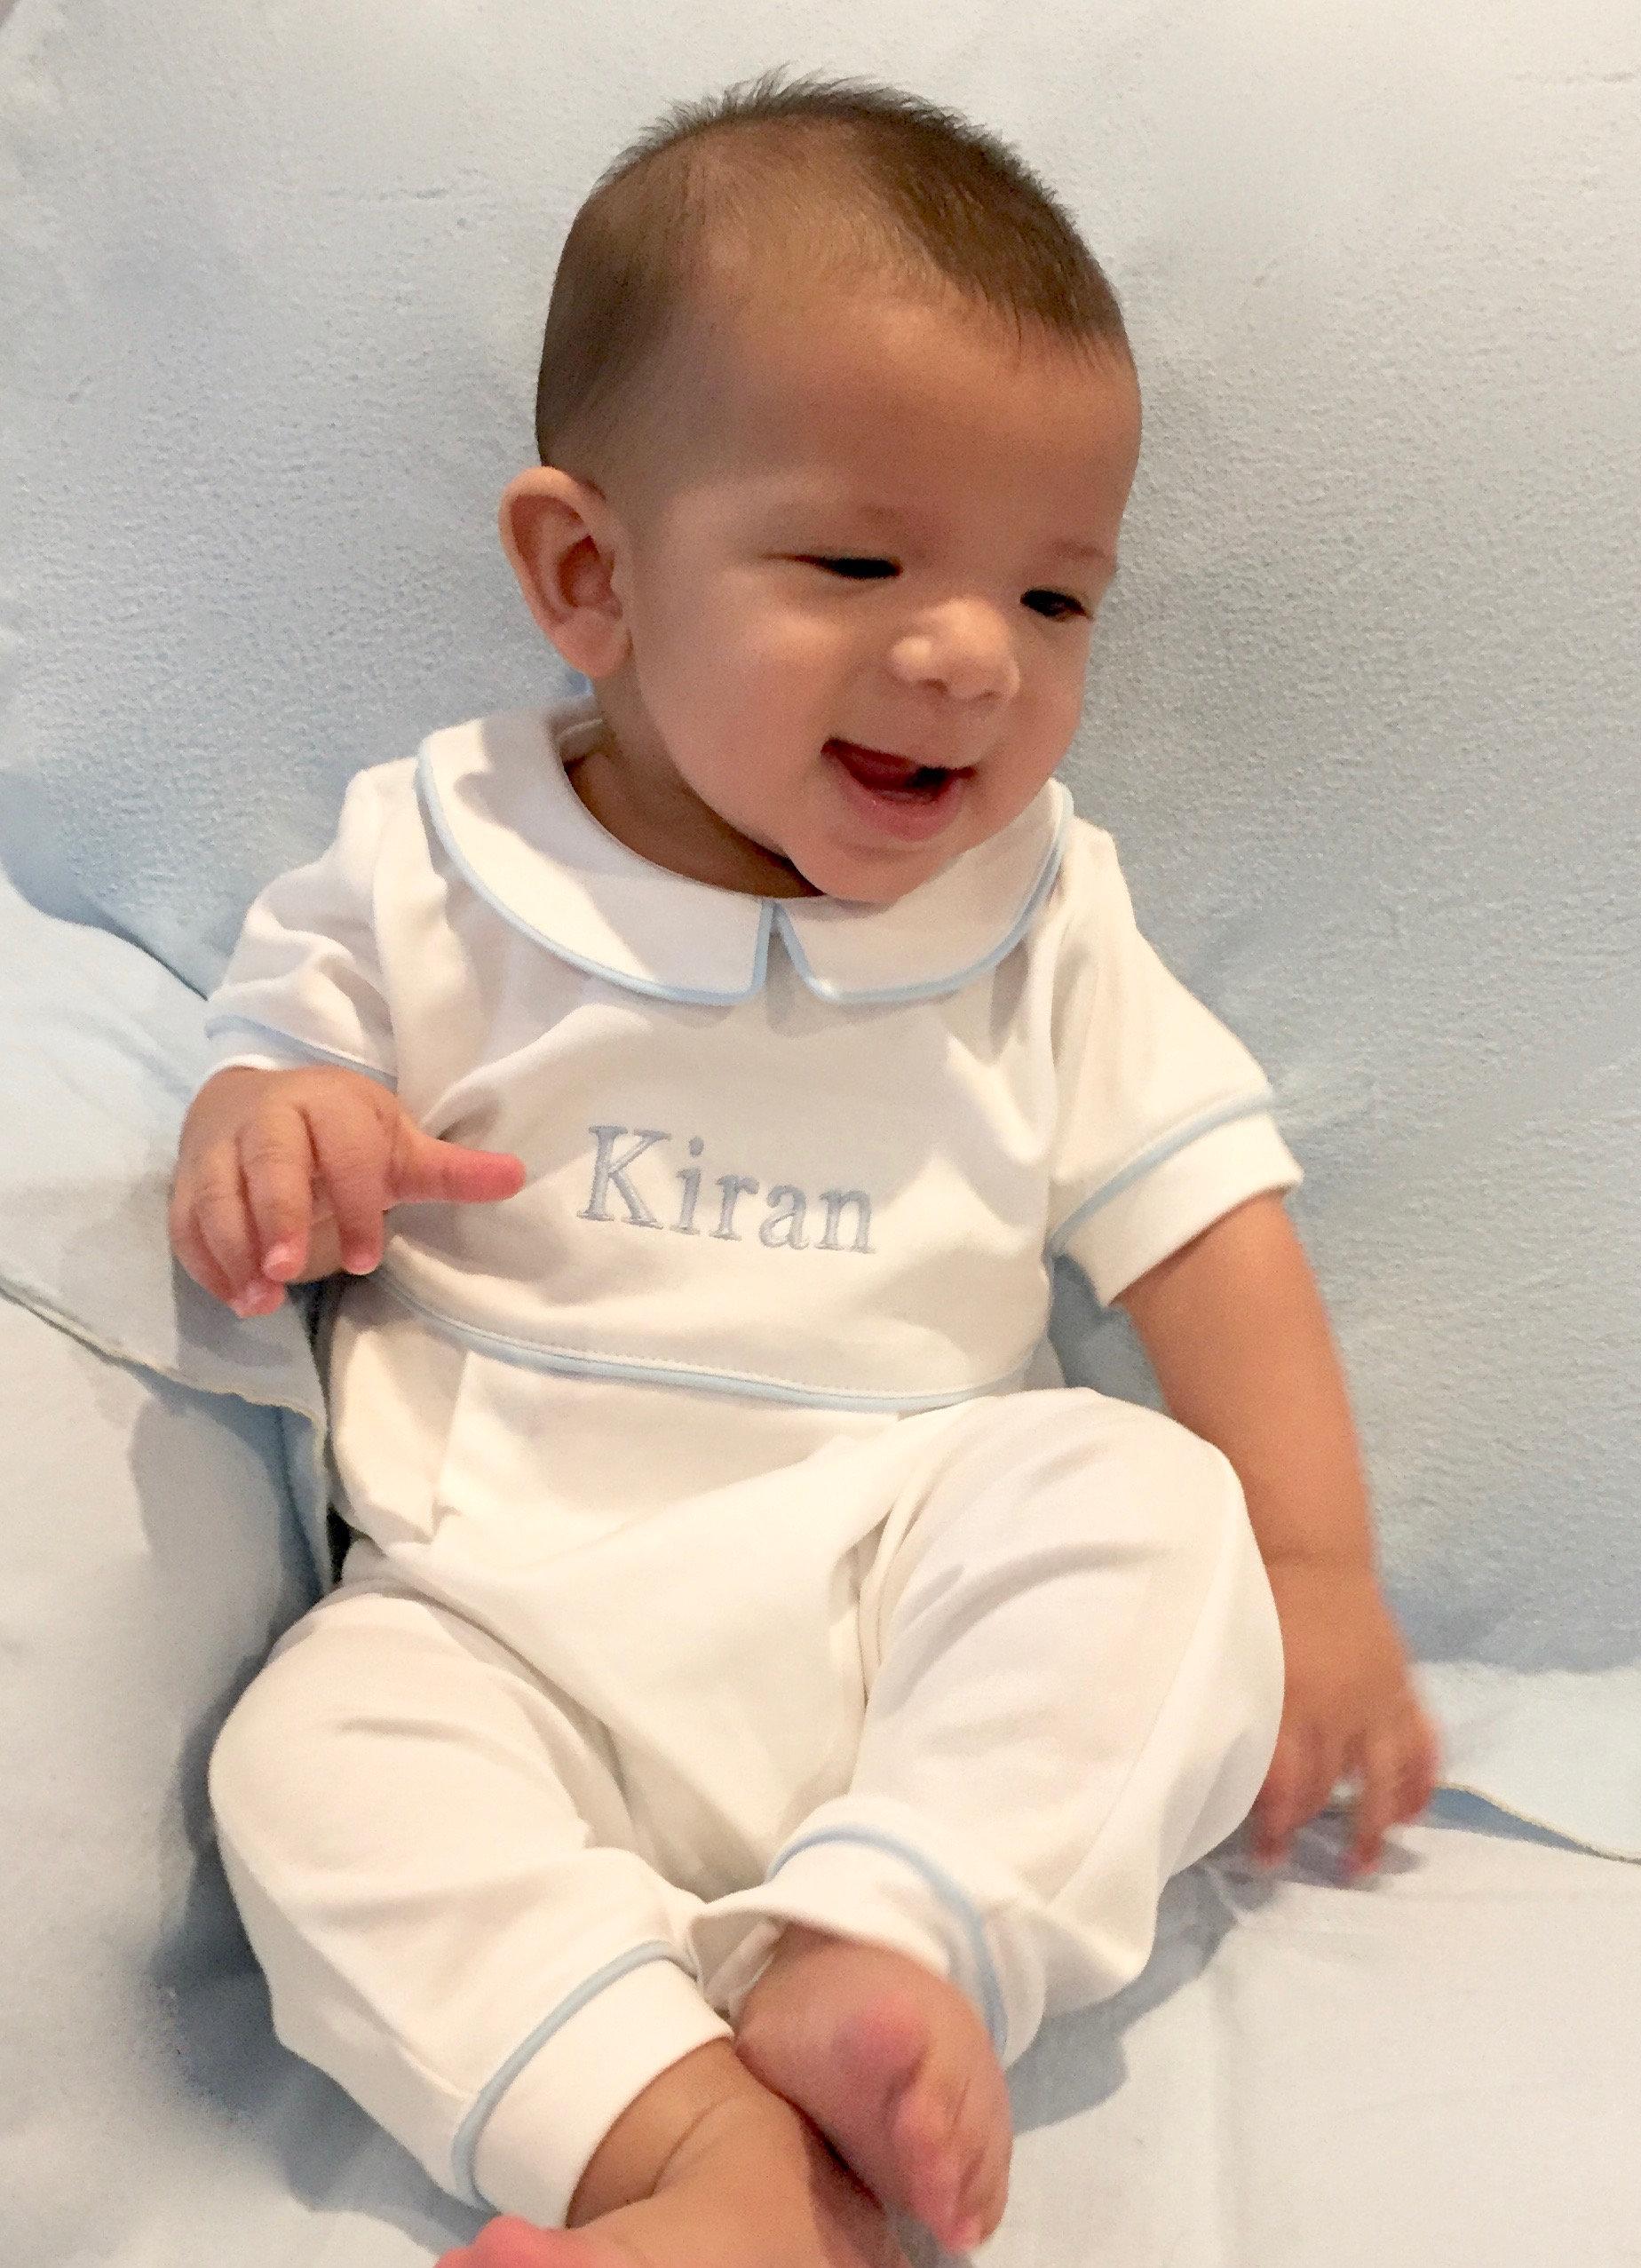 Kiran s Short Sleeve Long PantsNo Footie Outfit ing